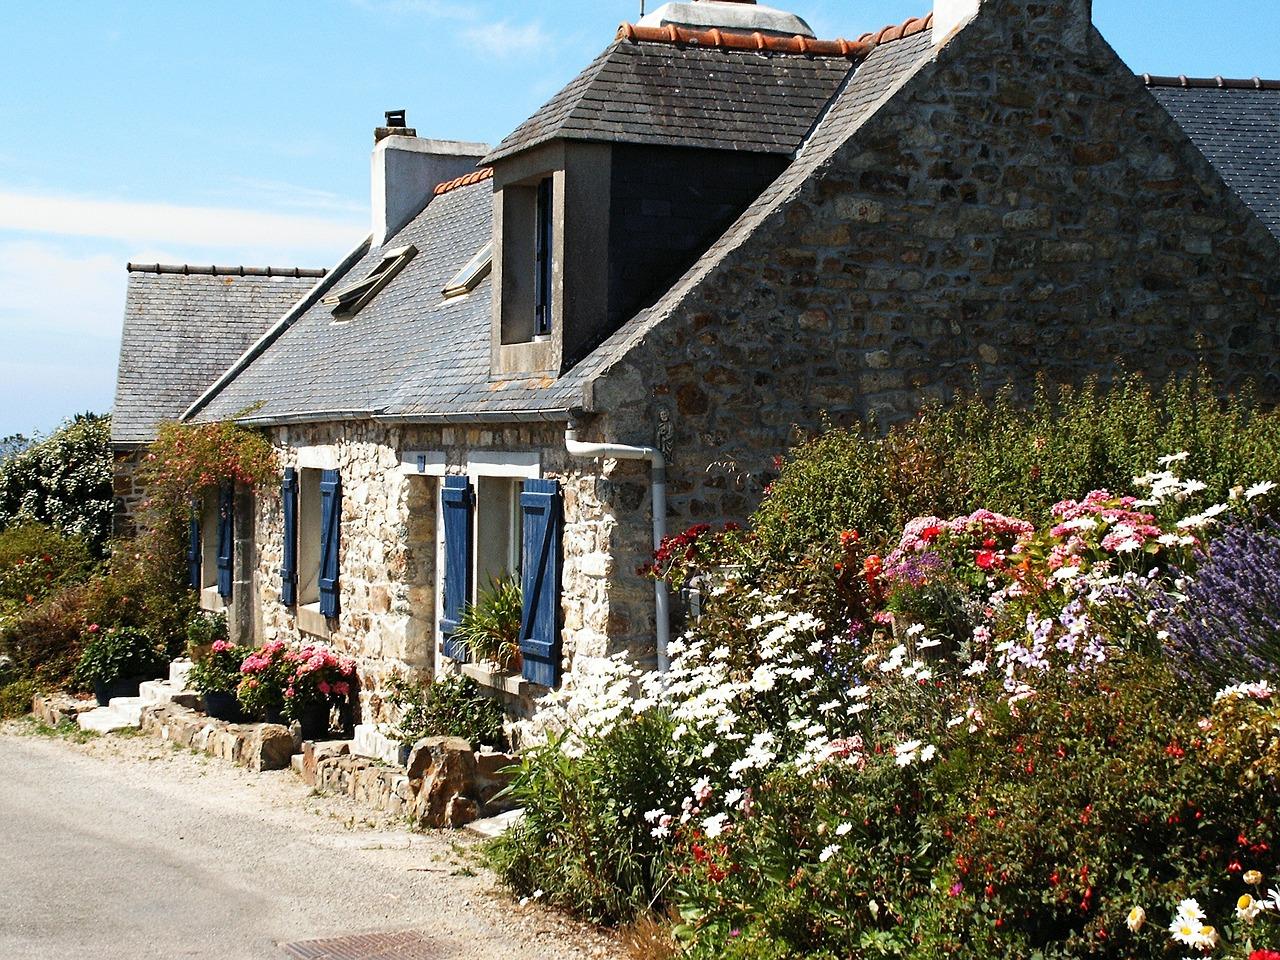 Randonn e en bretagne paysages pittoresques et les c ti res - Household water treatment a traditional approach ...